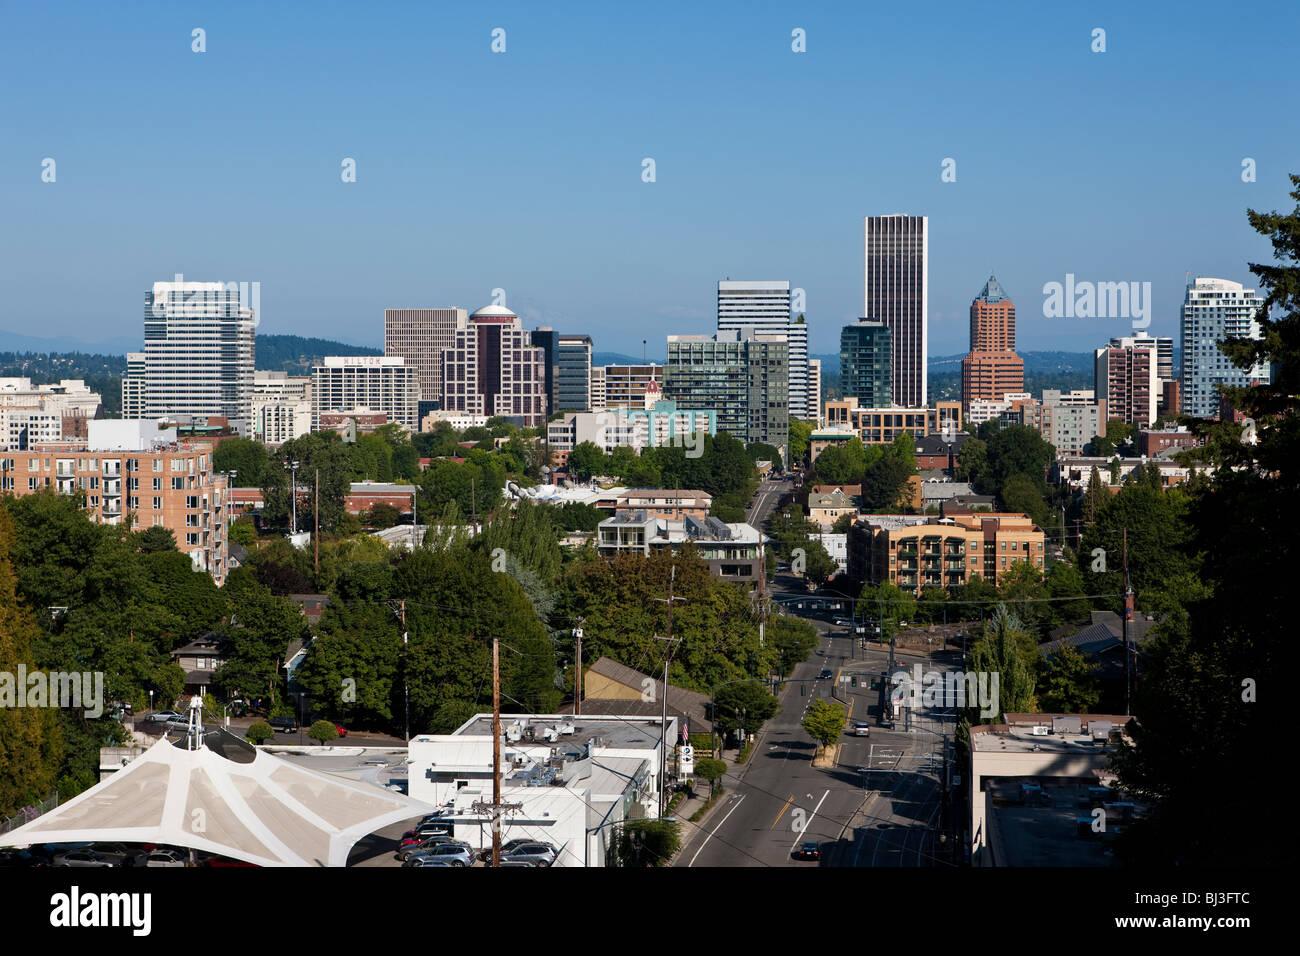 View of Portland, Orgeon, USA - Stock Image